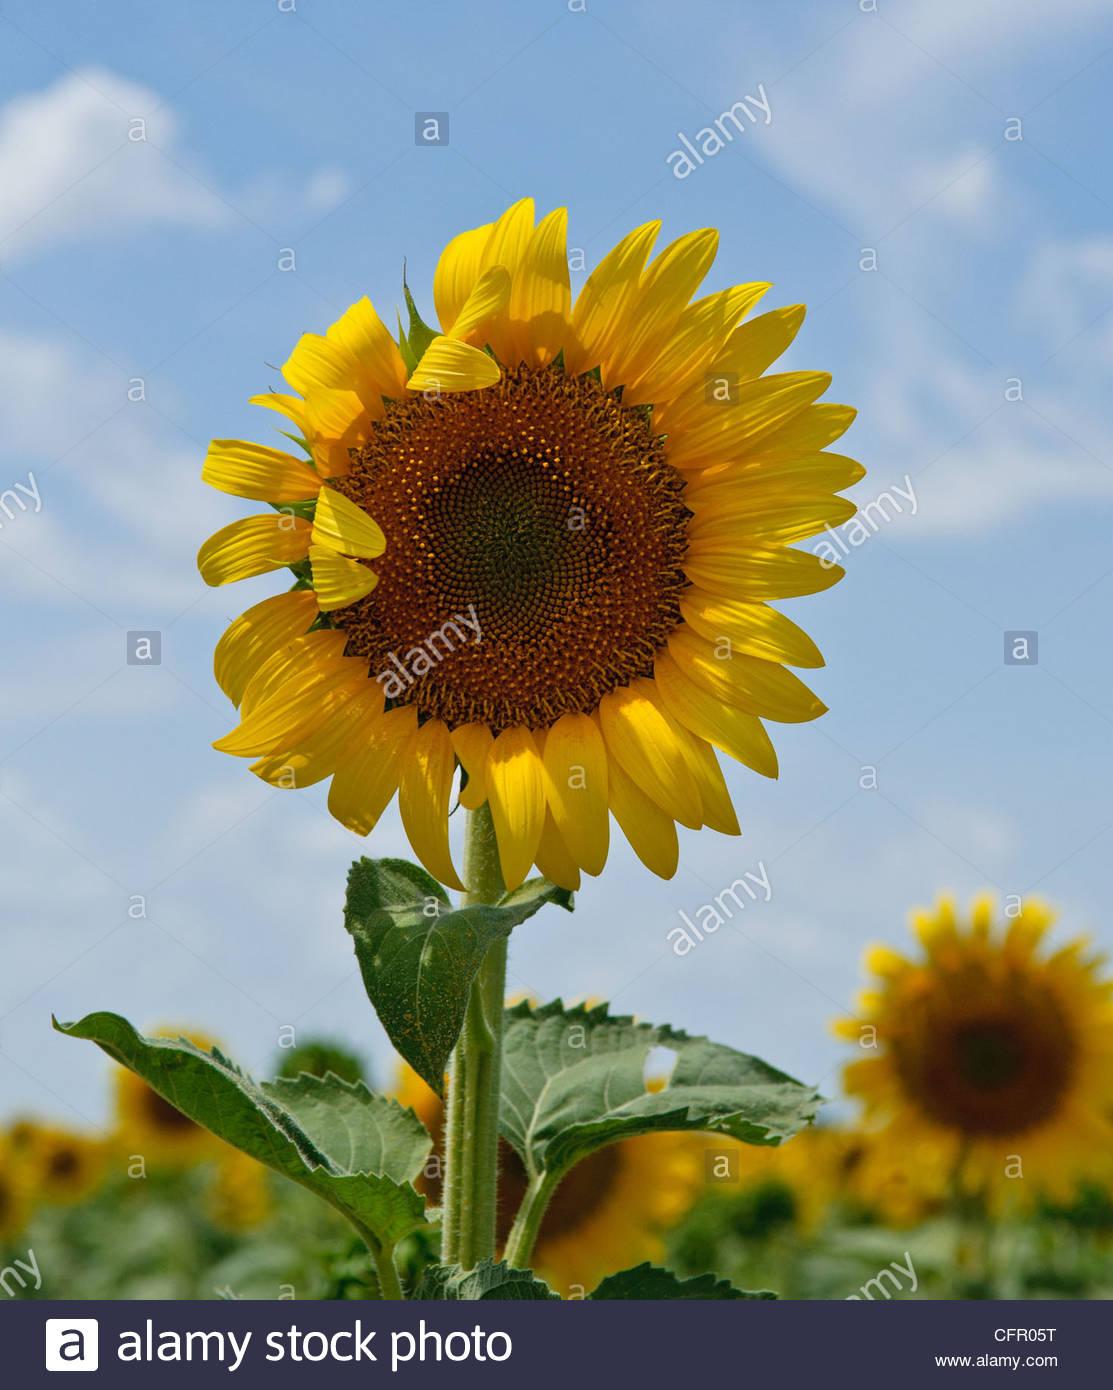 Individual Kansas Sunflowers, Sunflower crop, Partridge, KS, July 31, 2011 - Stock Image